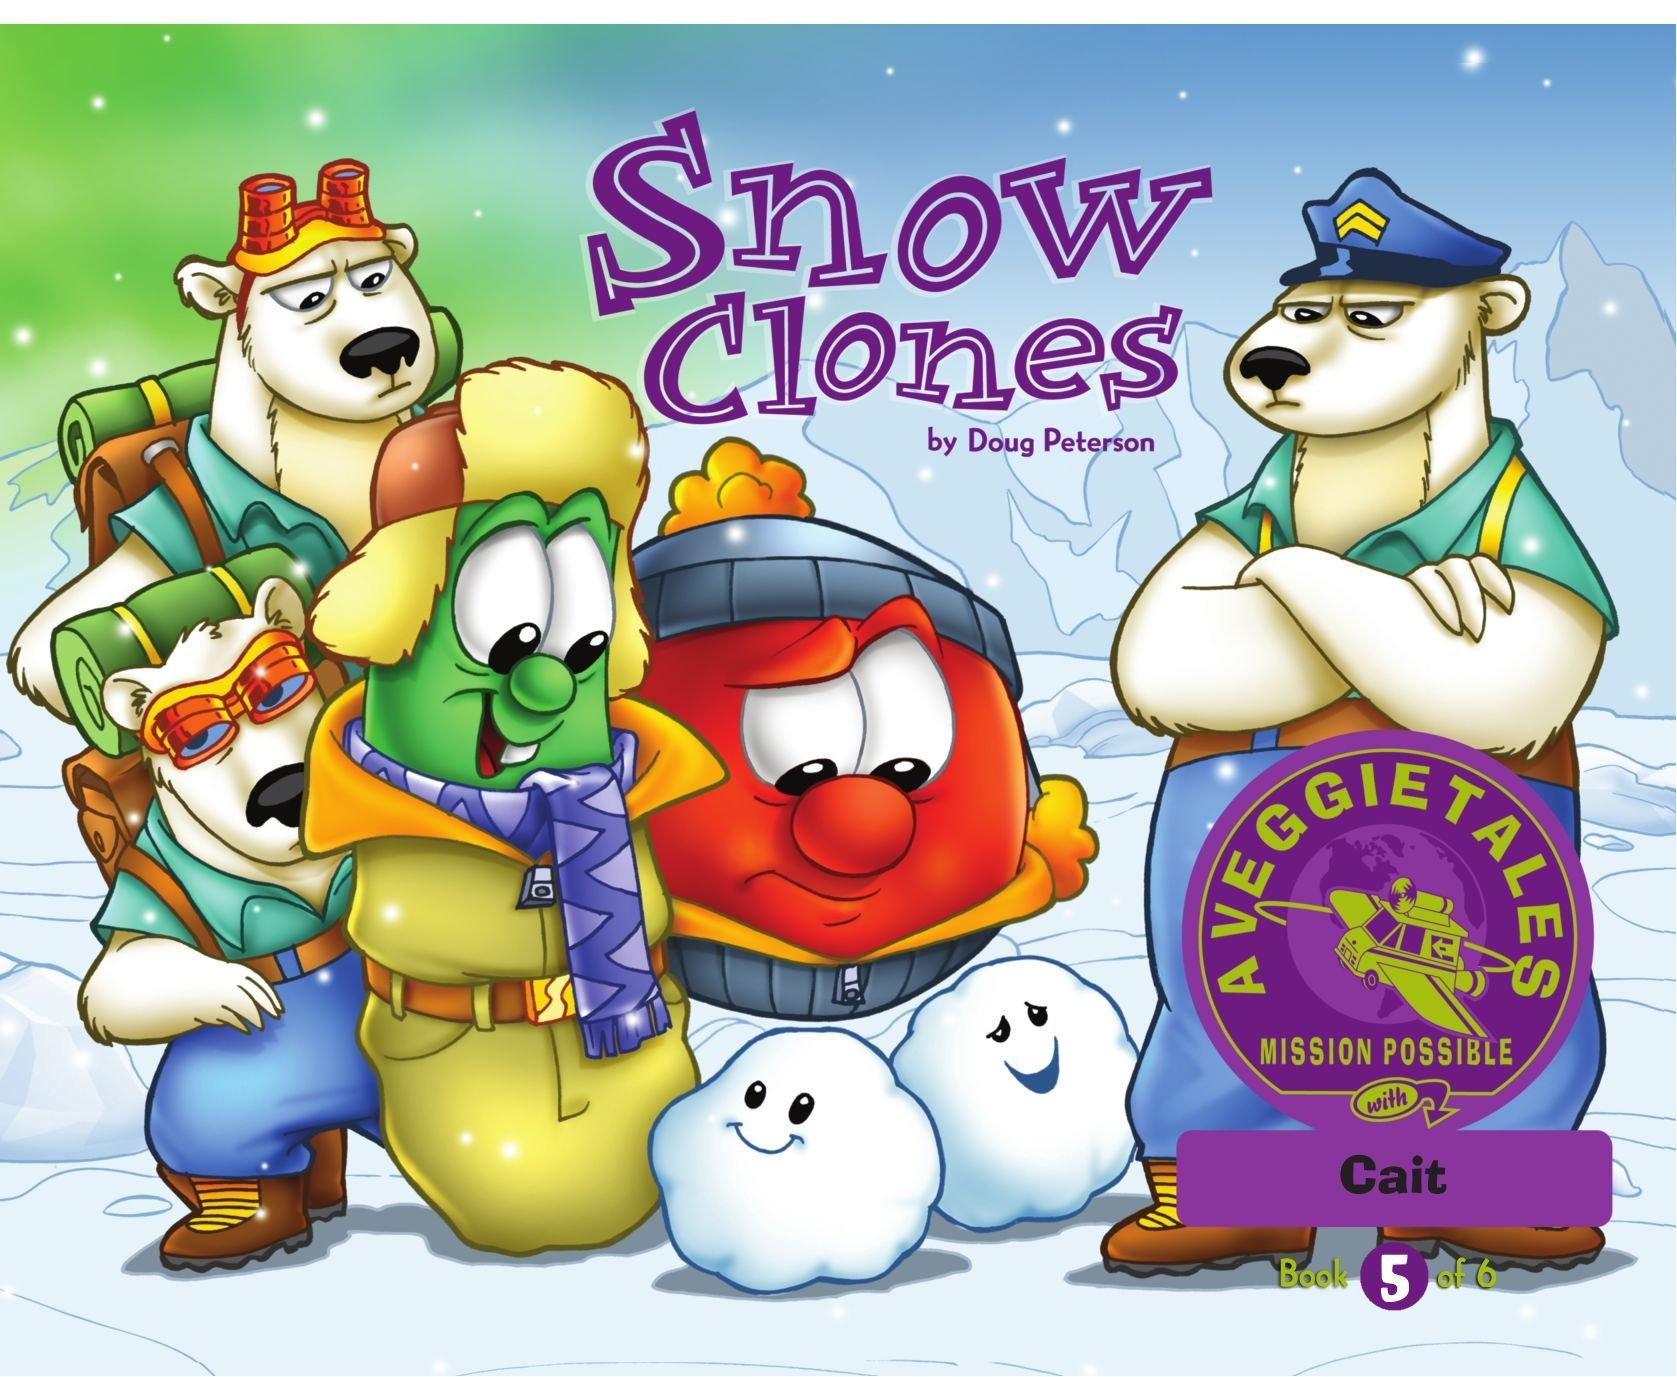 Download Snow Clones - VeggieTales Mission Possible Adventure Series #5: Personalized for Cait (Boy) ebook